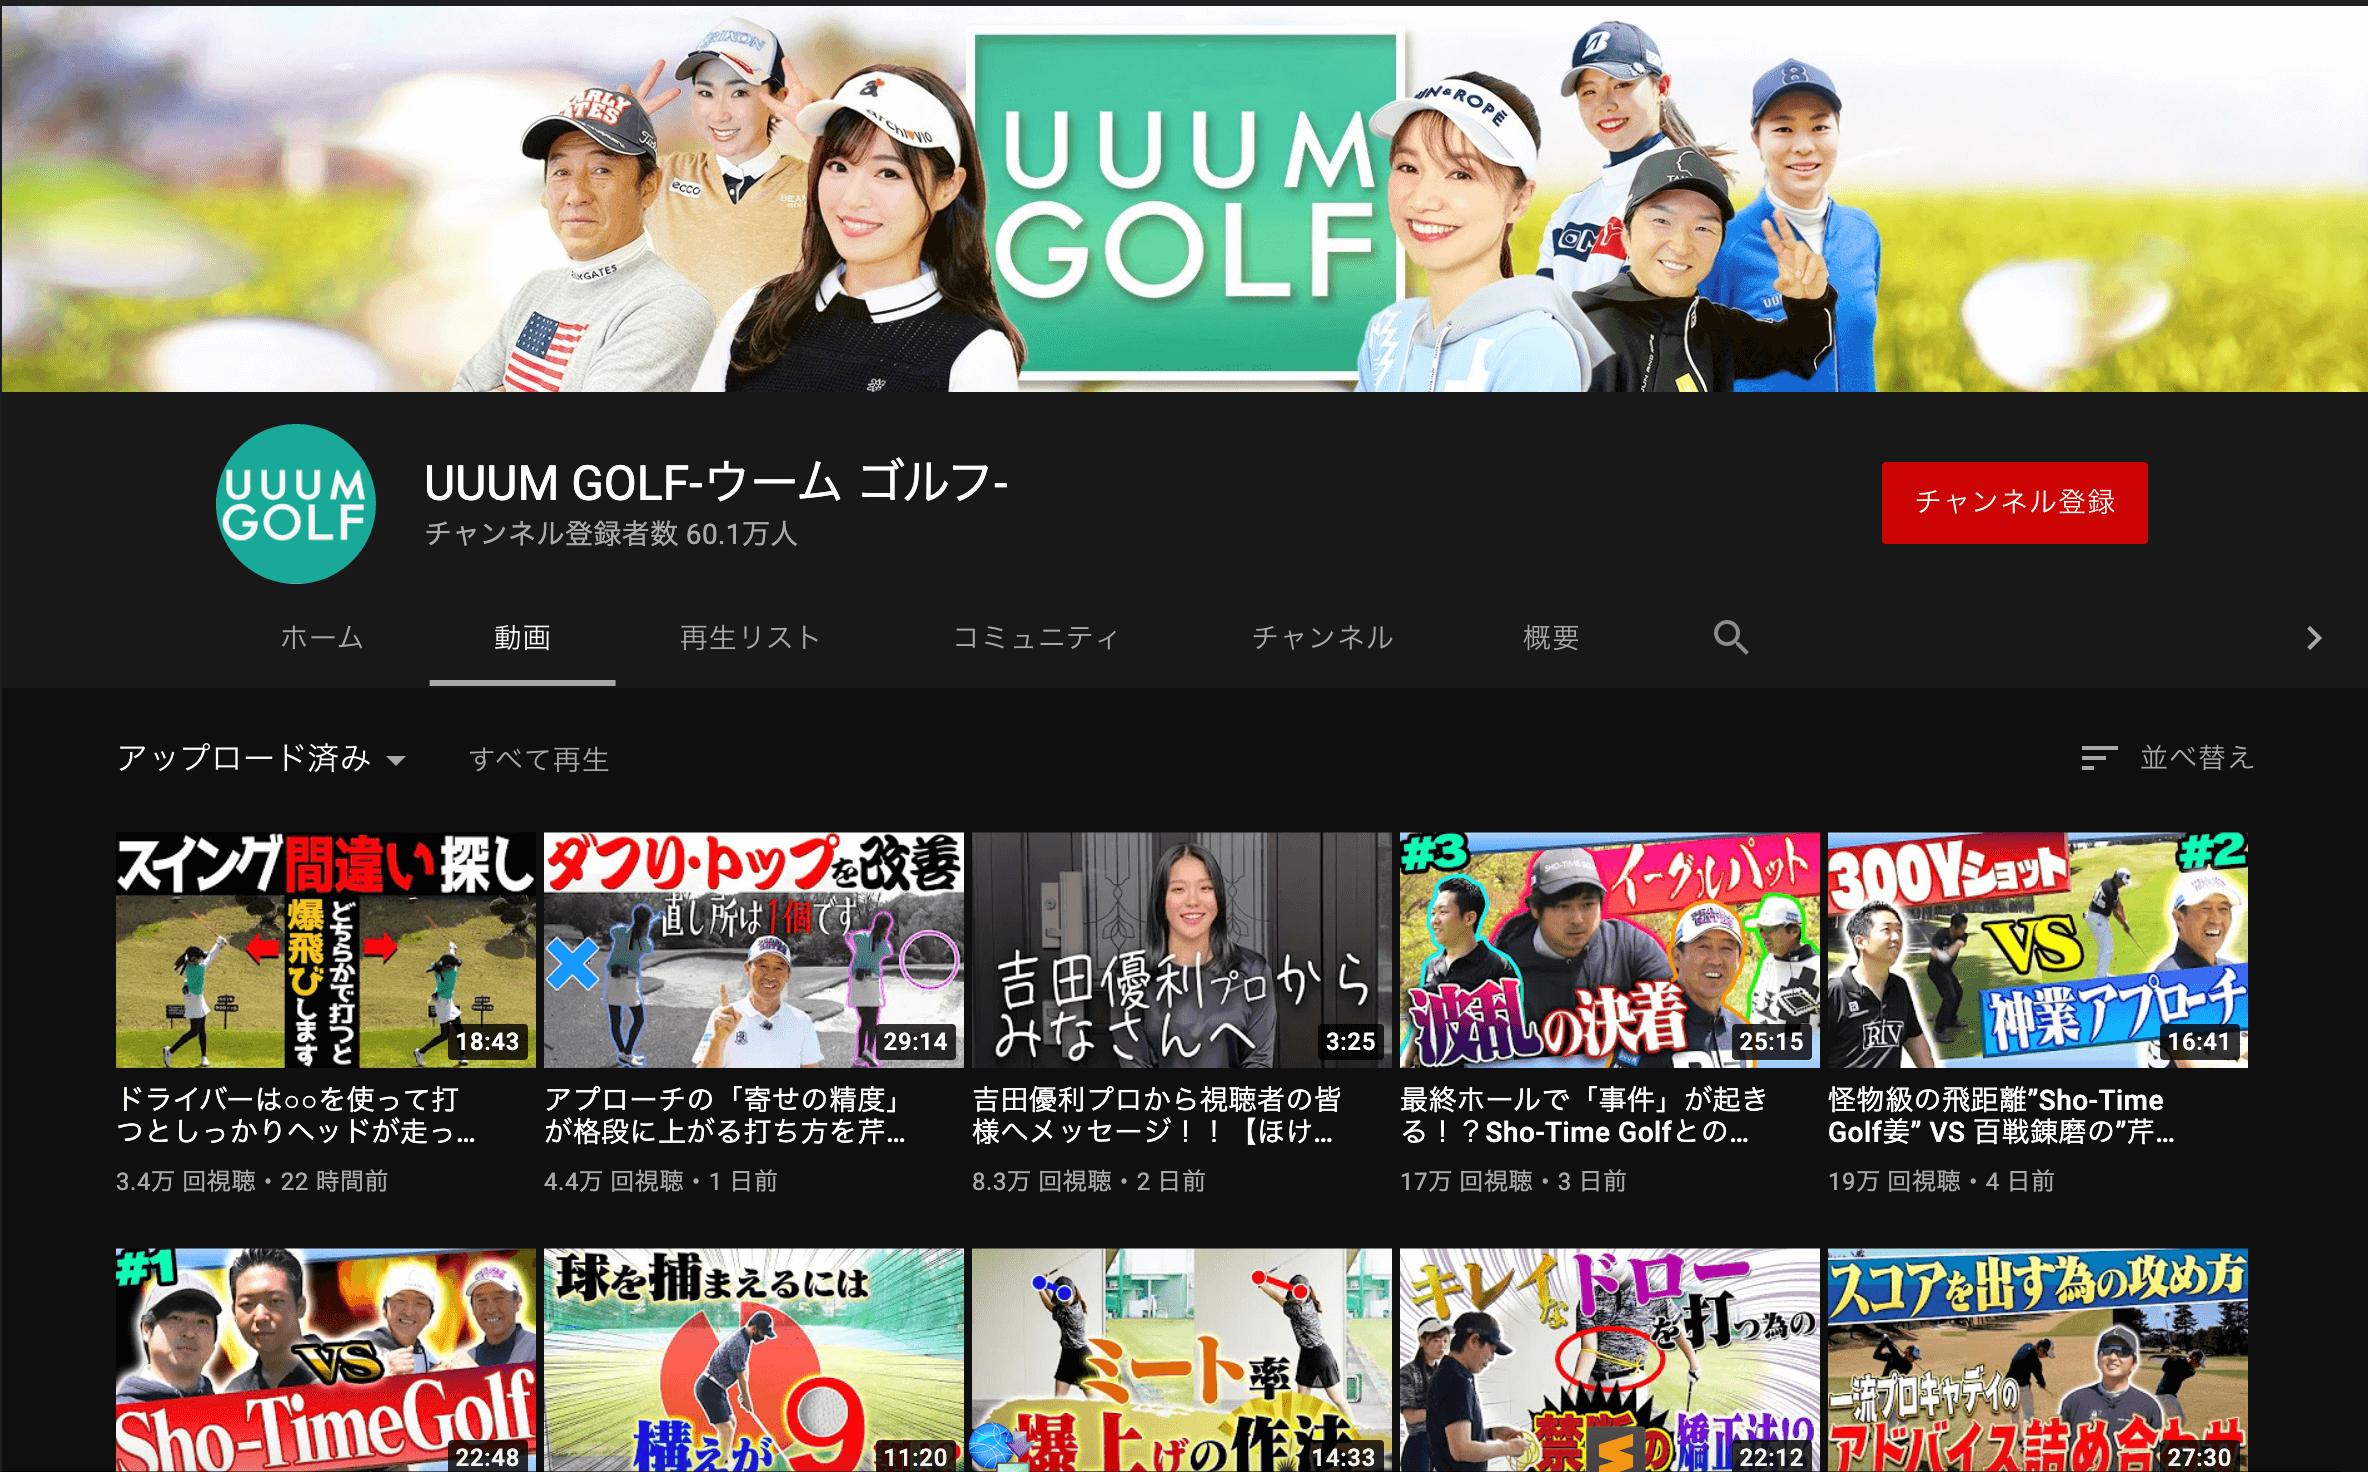 youtube_golf_uuumgolf